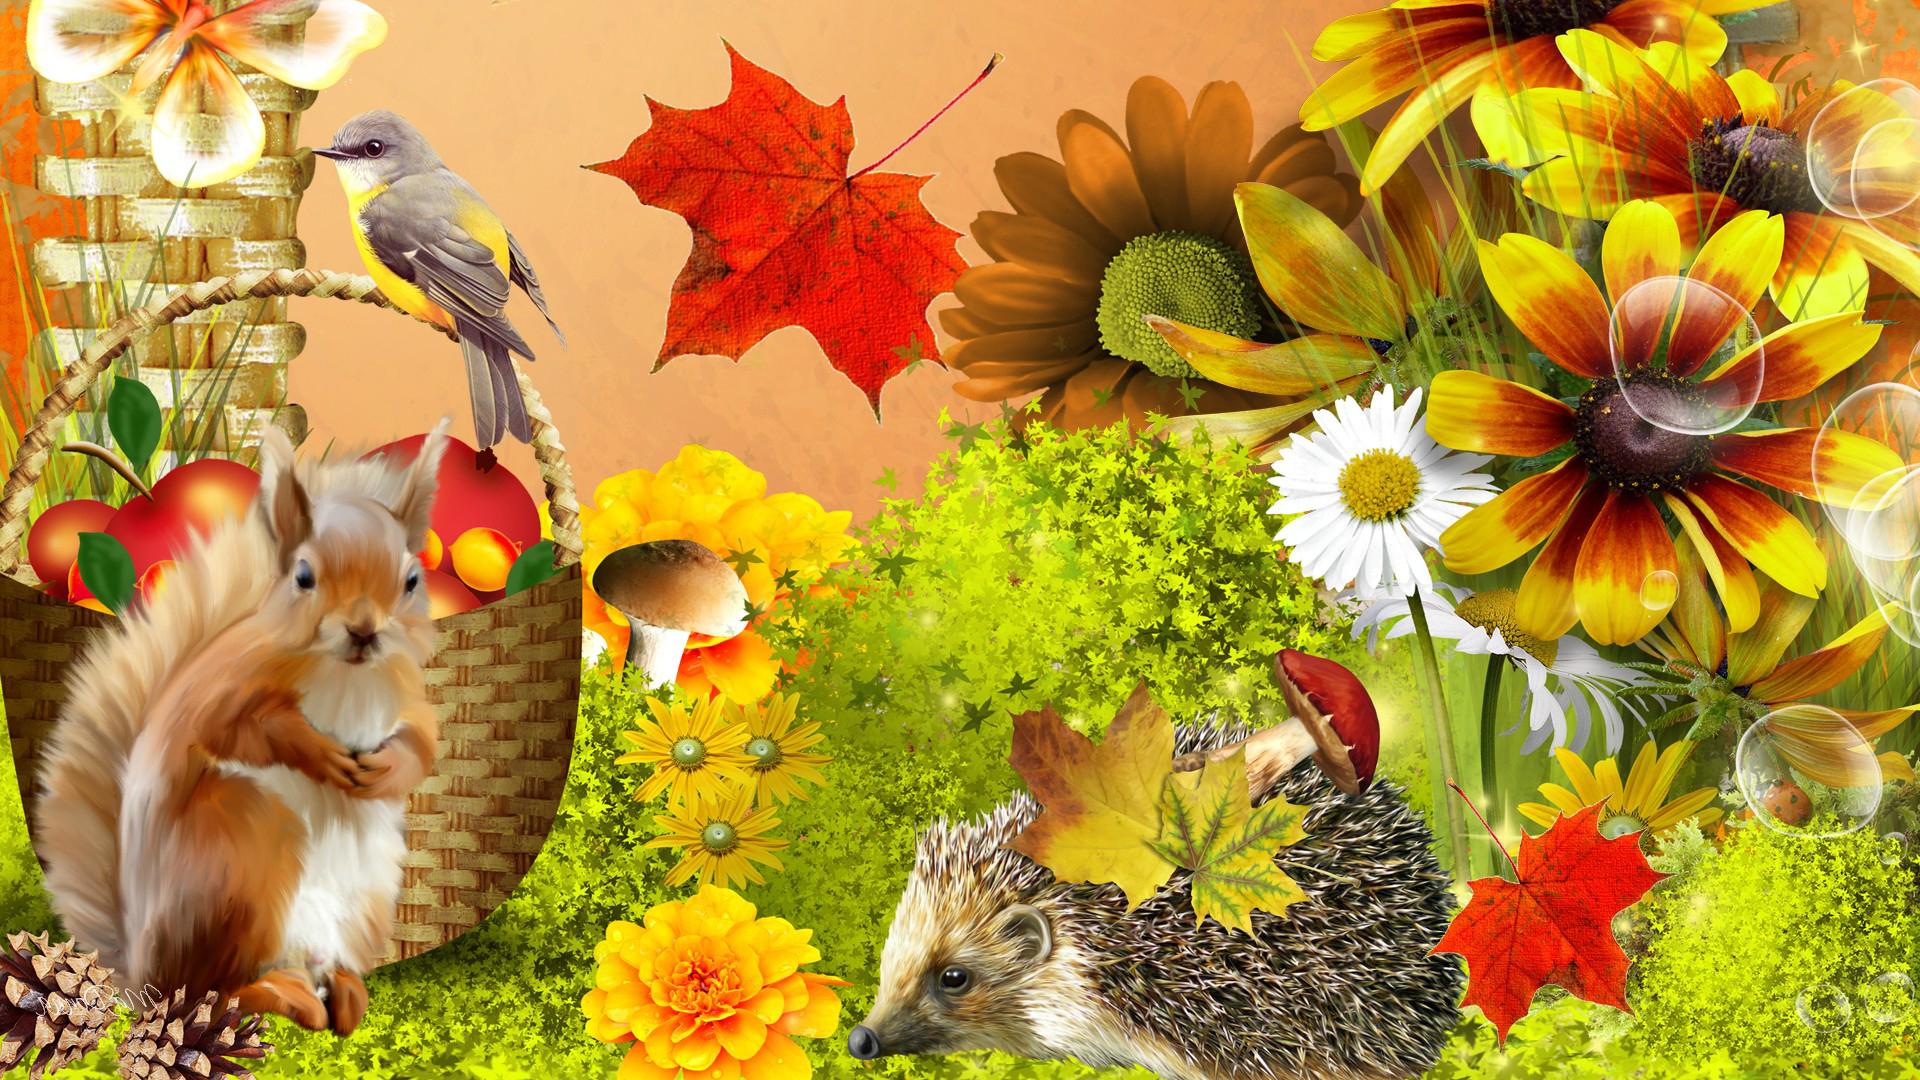 Autumn Flower for Wallpaper WallpaperSafari